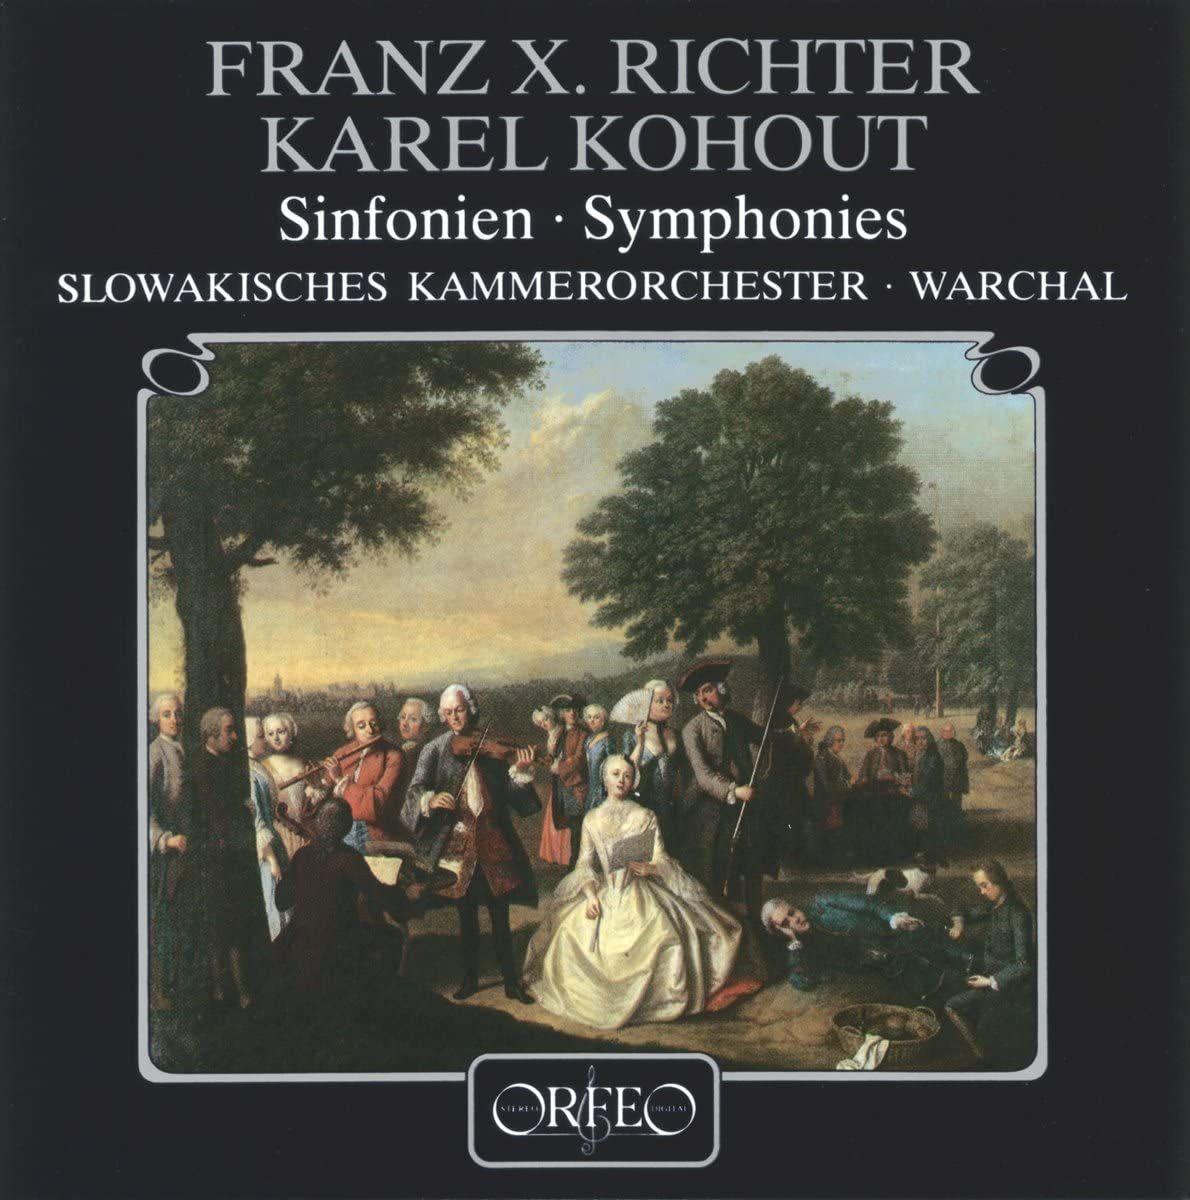 Photo No.1 of Franz Xaver Richter • Karel Kohout Symphonies (120 g)